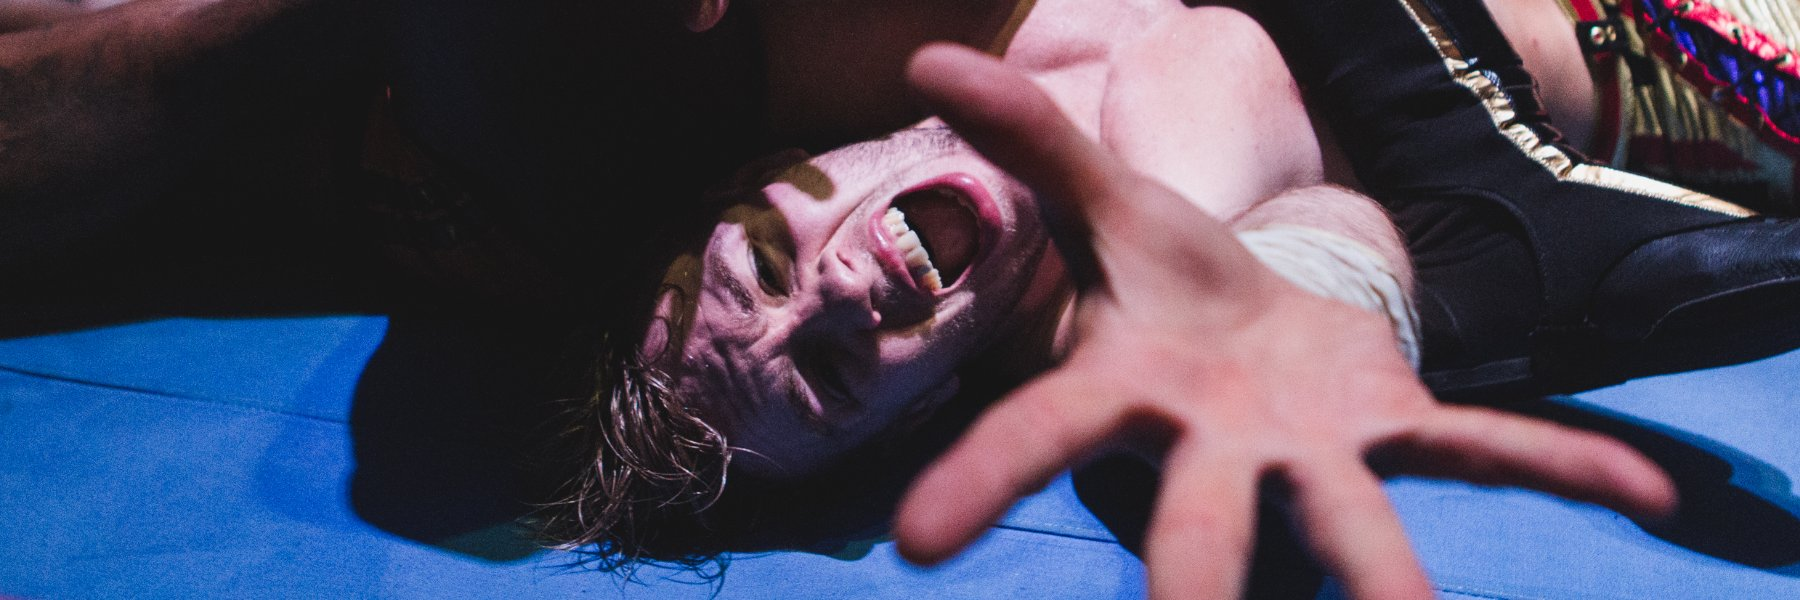 Shane Strickland vs Will Ospreay - June 2017 - Highlights